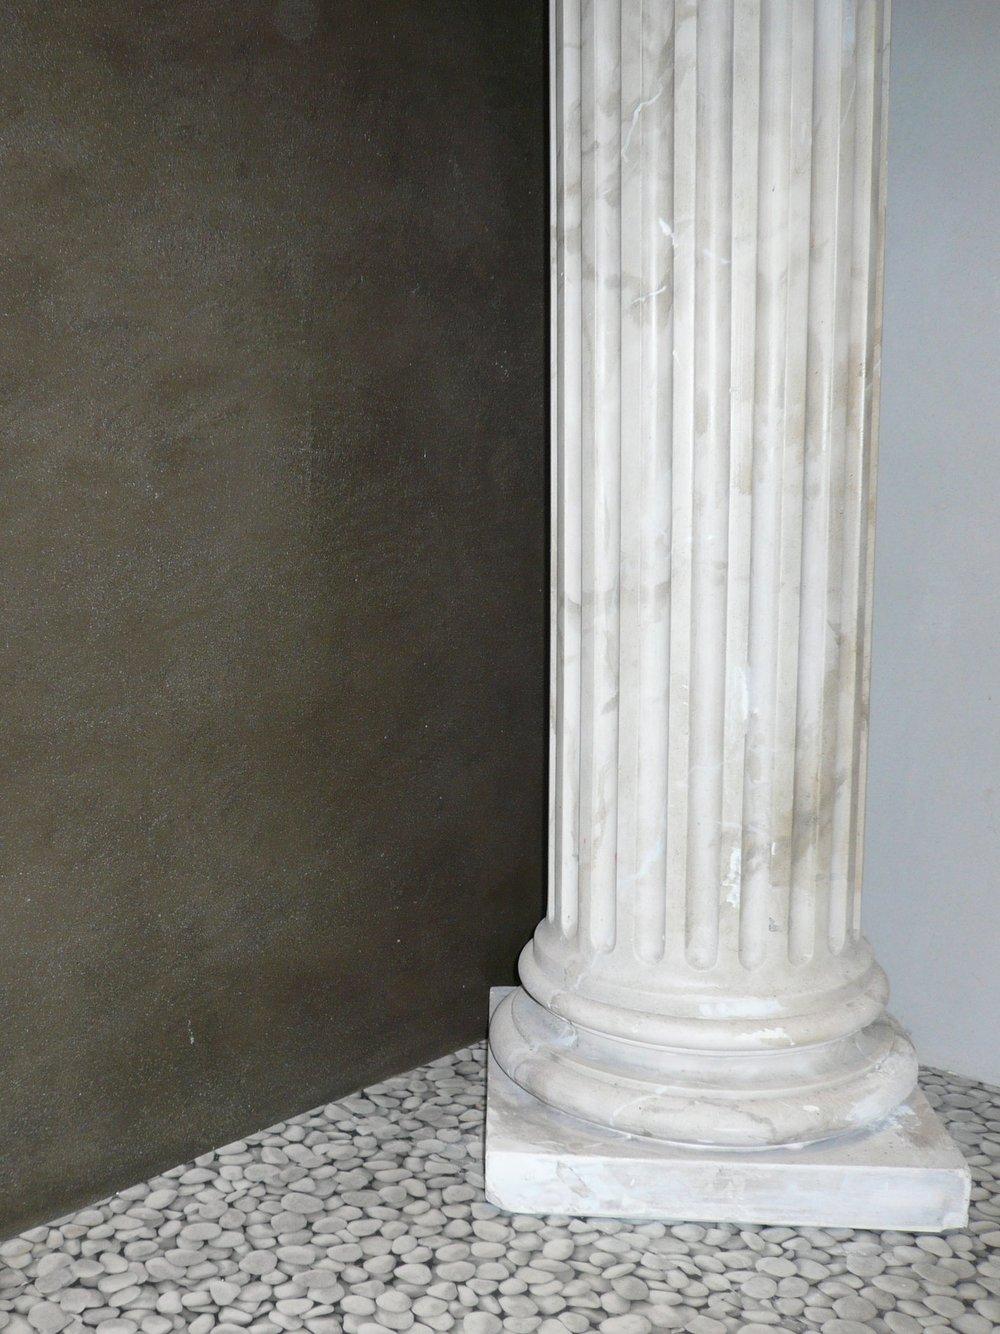 Marmorierte Säule vor Kalkwand